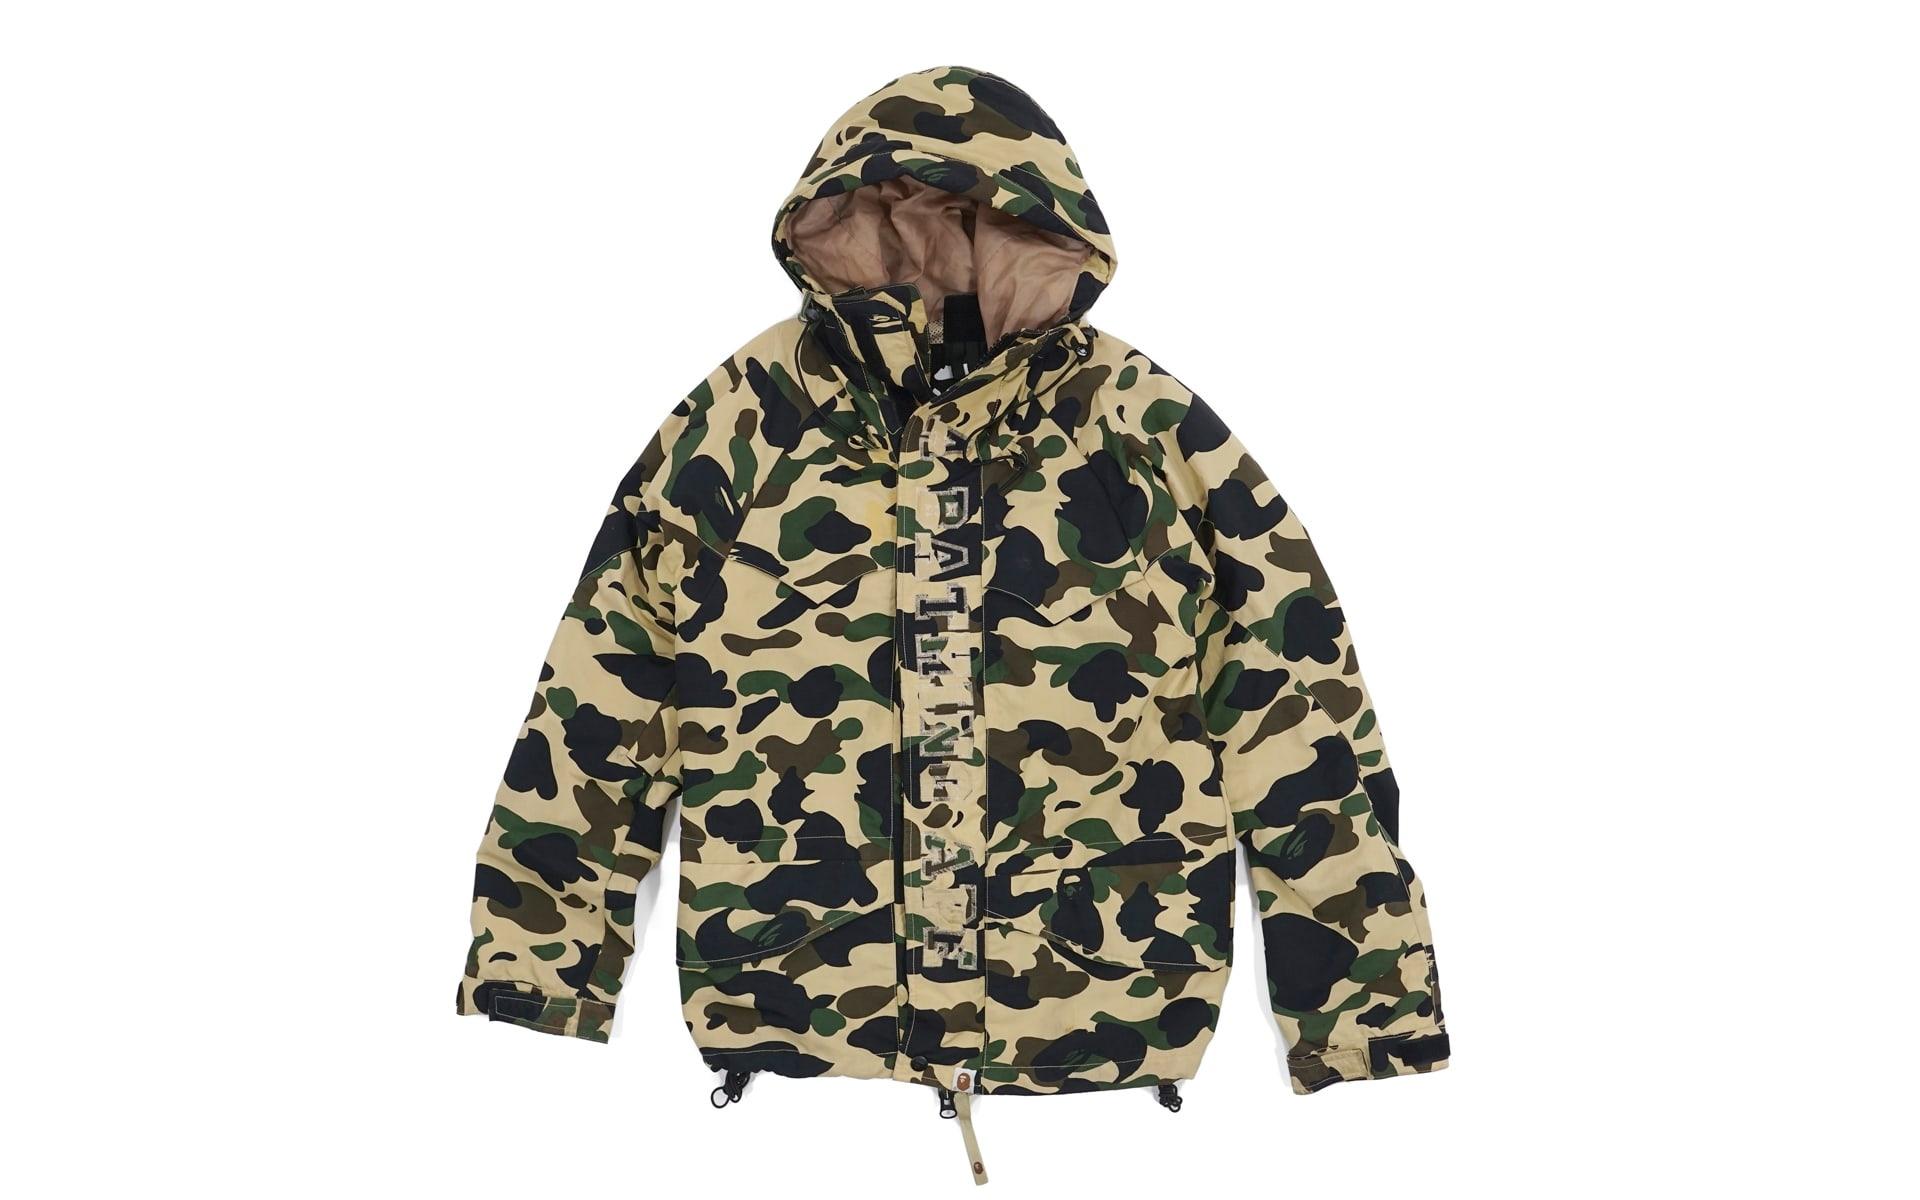 20de866421fe Bape 1st Camo Snowboard Jacket